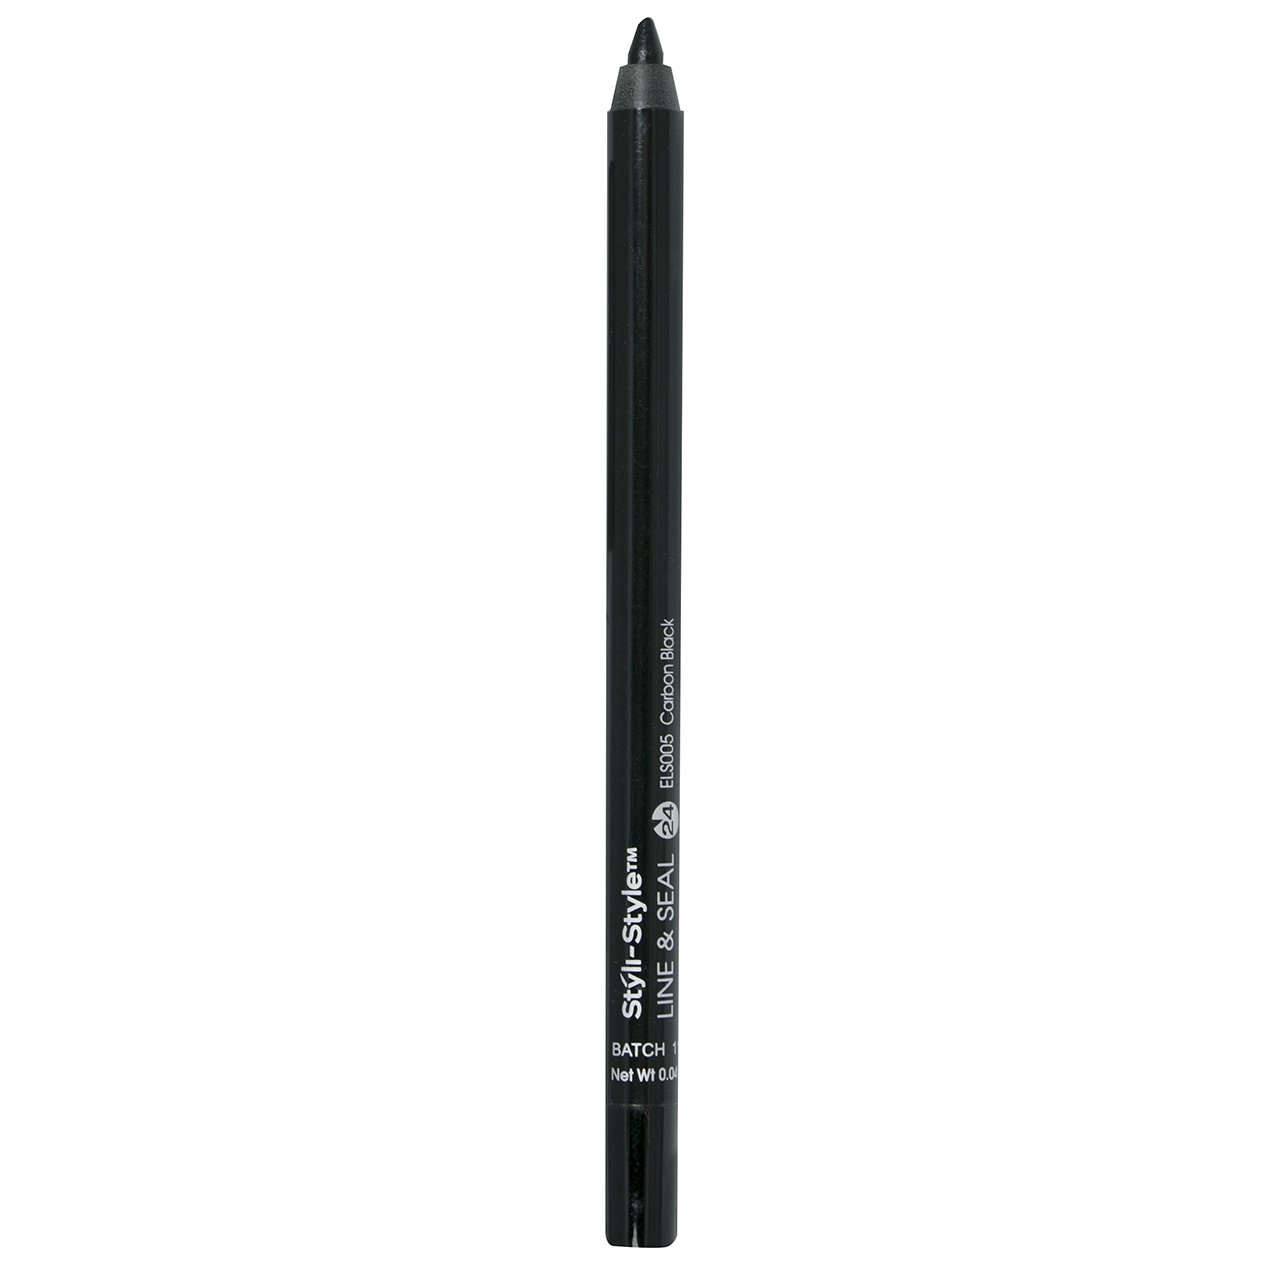 Styli Style Line & Seal Eyes, 24 Hour, Black Pearl 140 - 0.04 oz